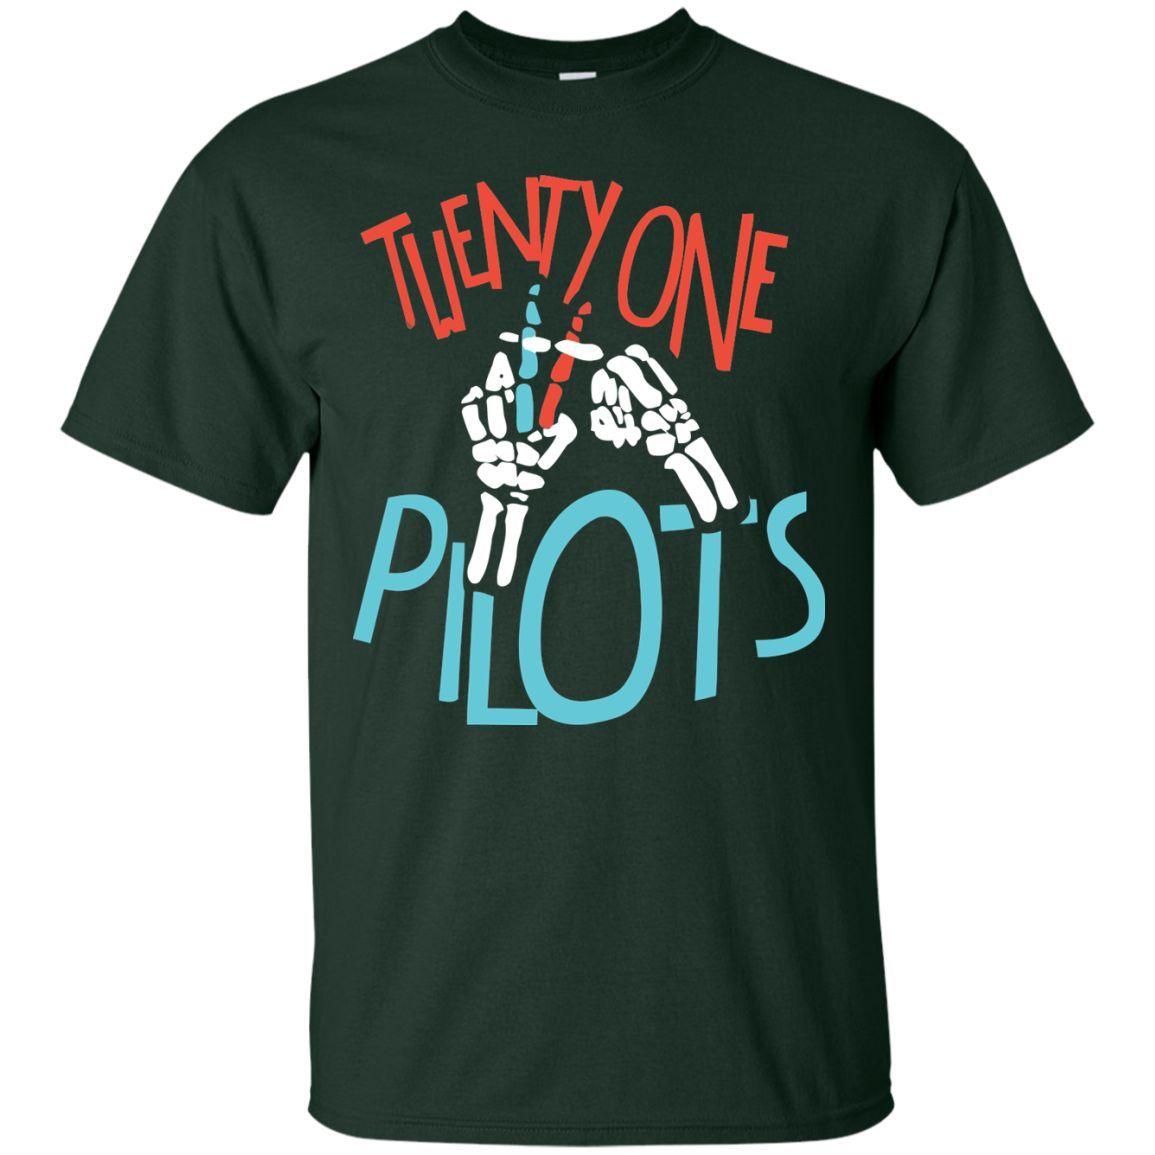 a67ee7891 21 Pilot - Twenty one Tshirt Pilot Lover | TØP | Twenty one pilots ...